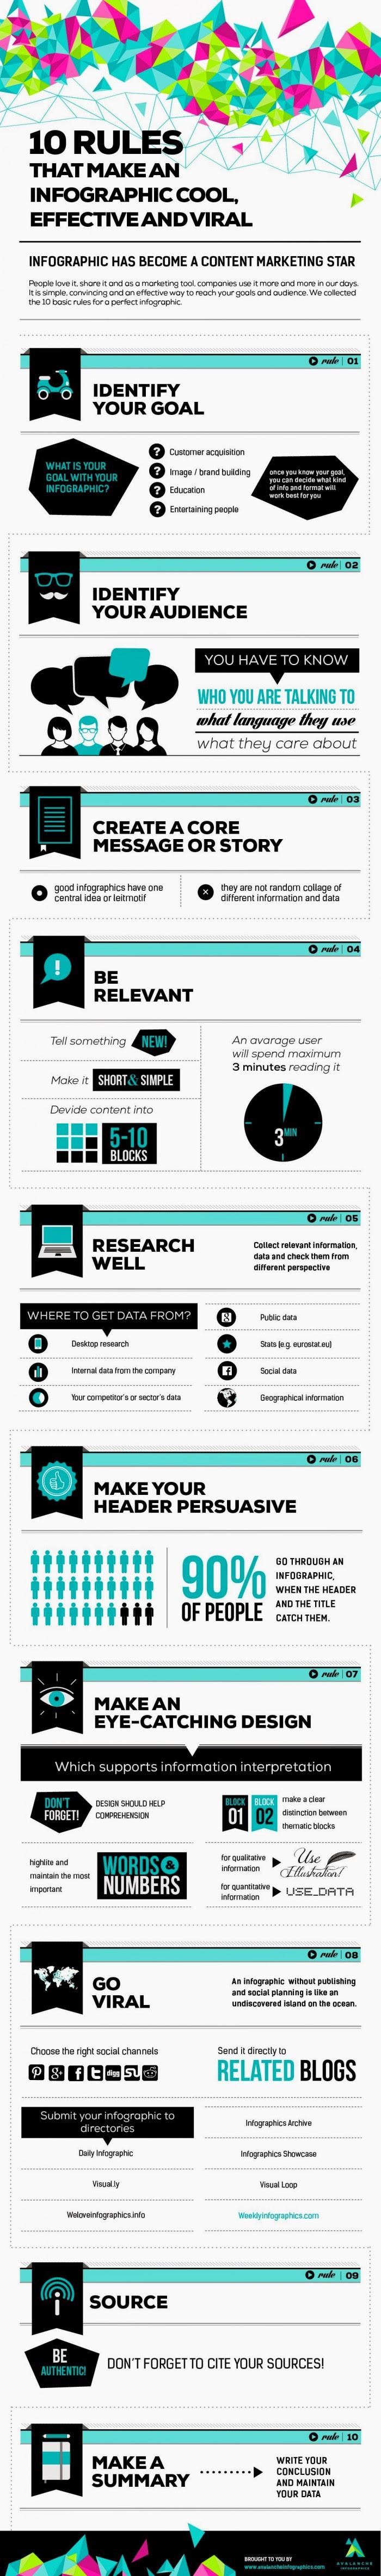 10-reglas-about-infographics